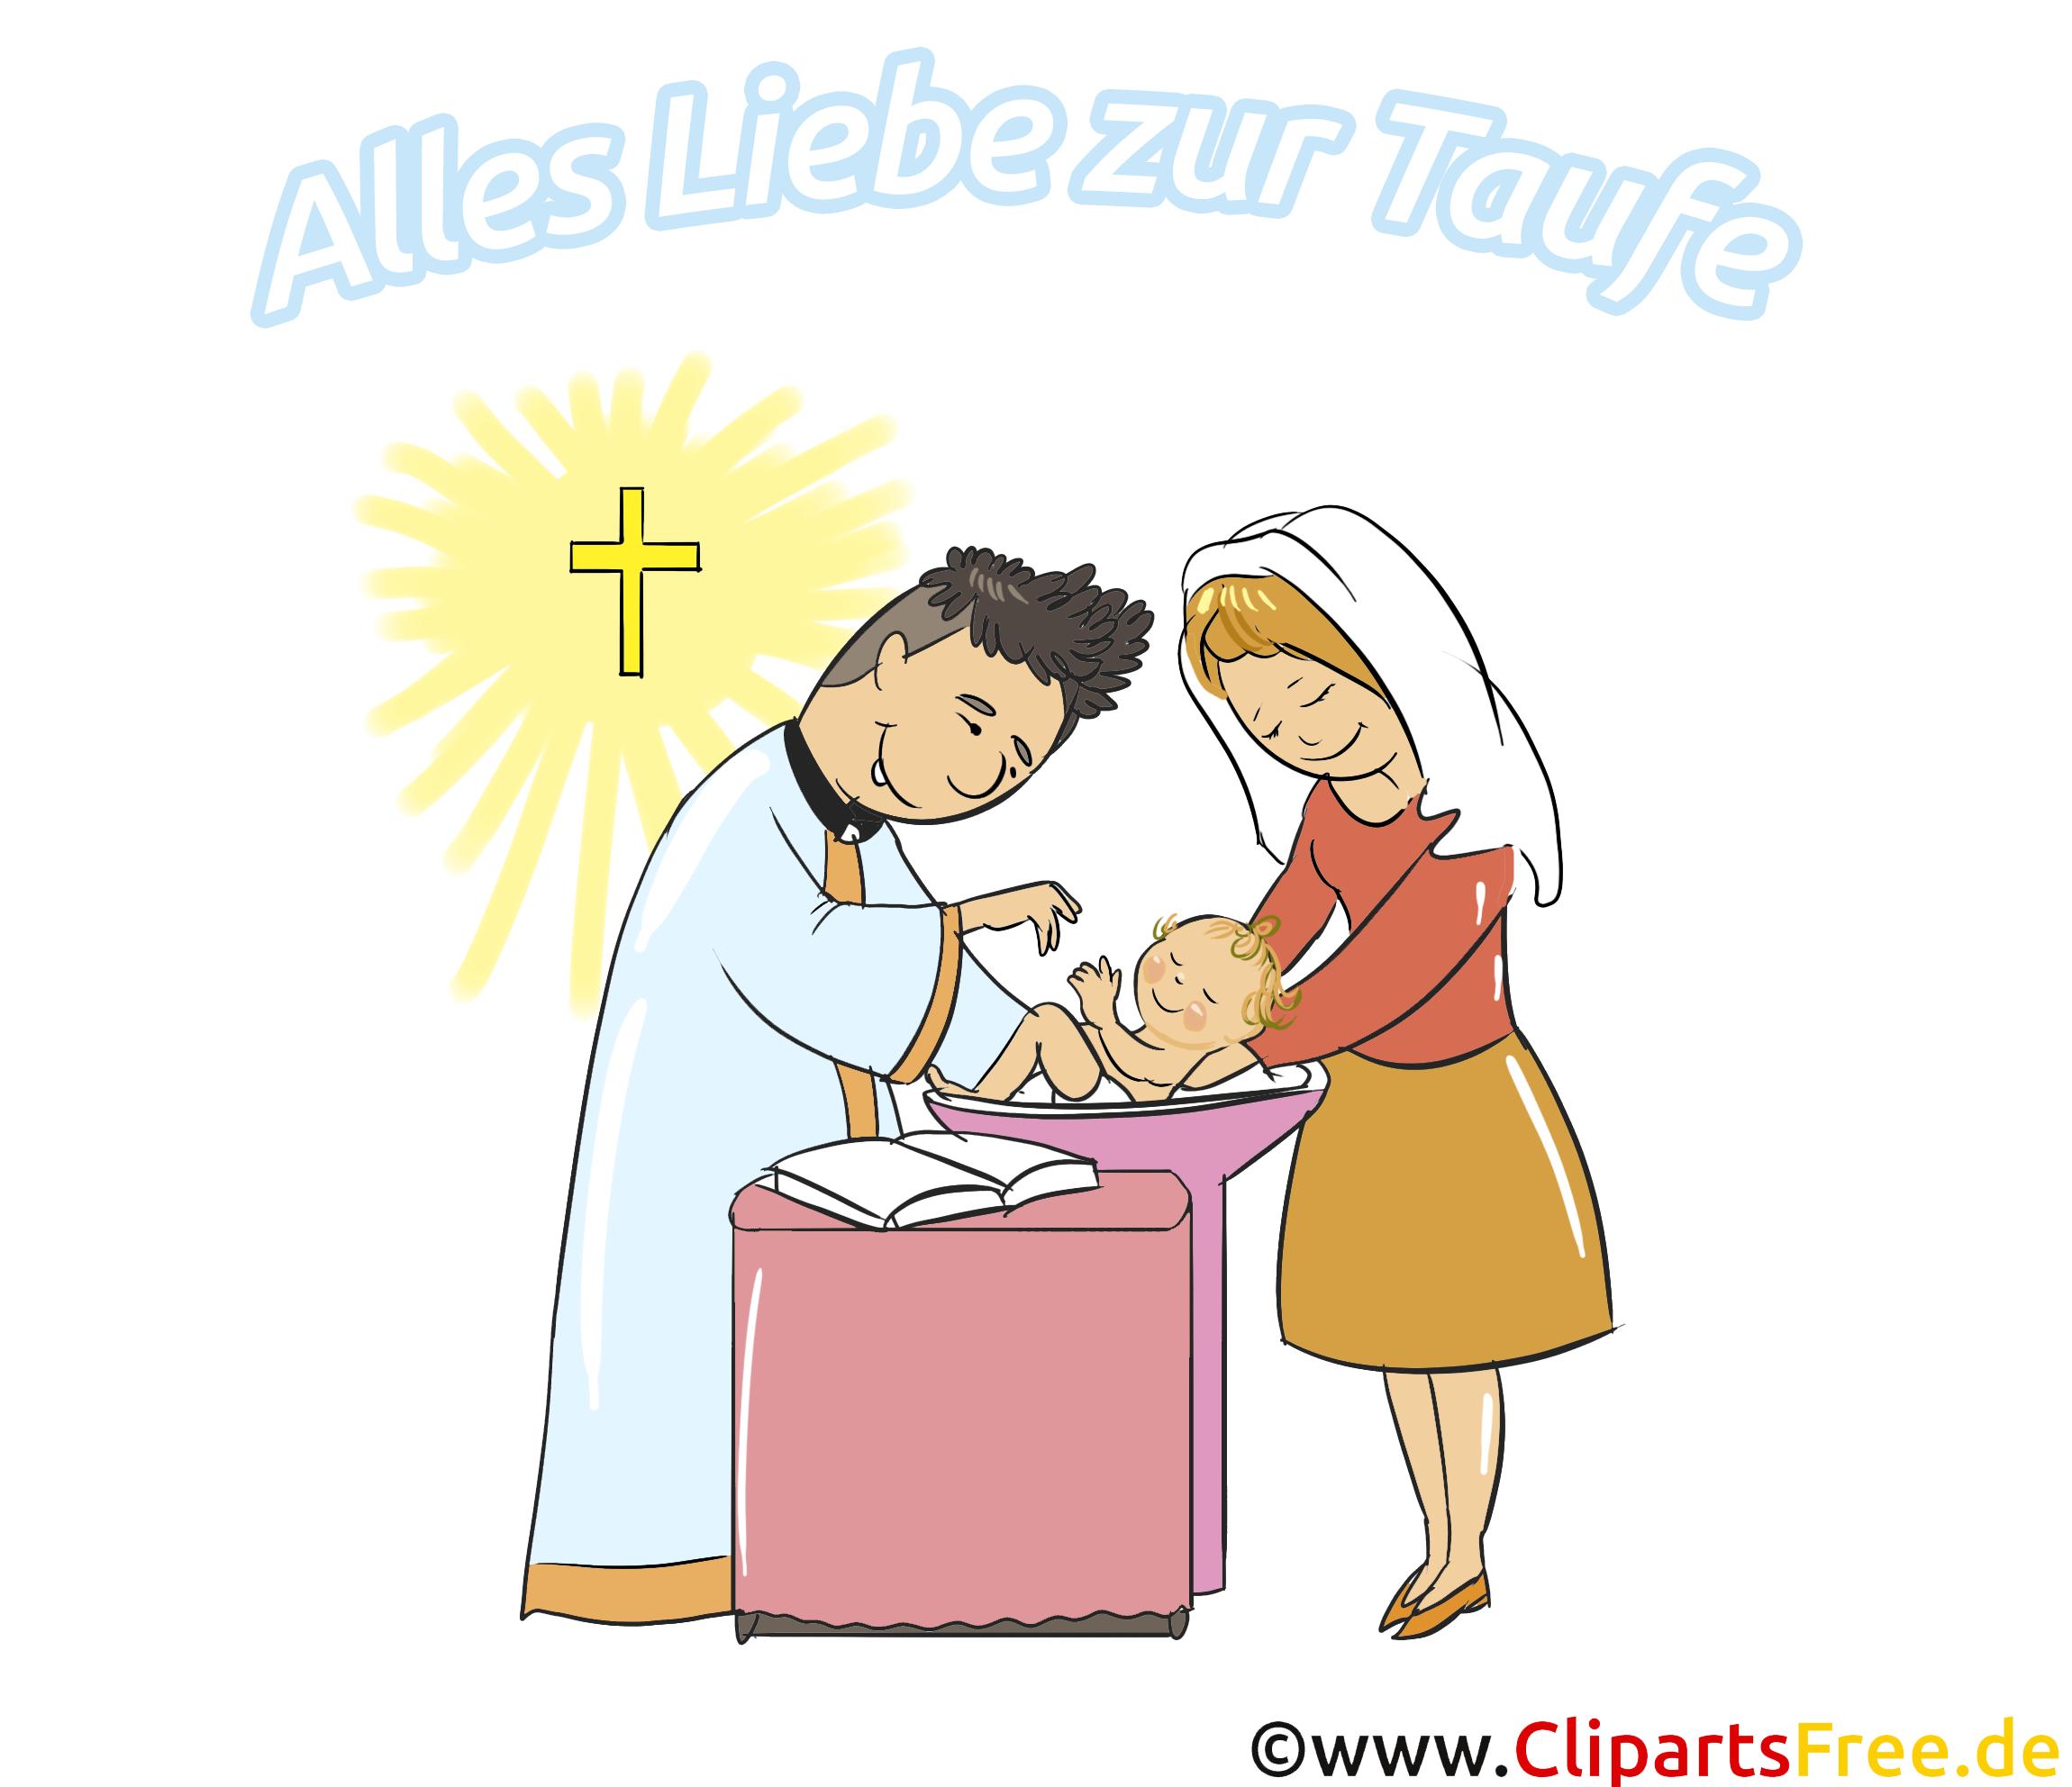 Zum Taufe